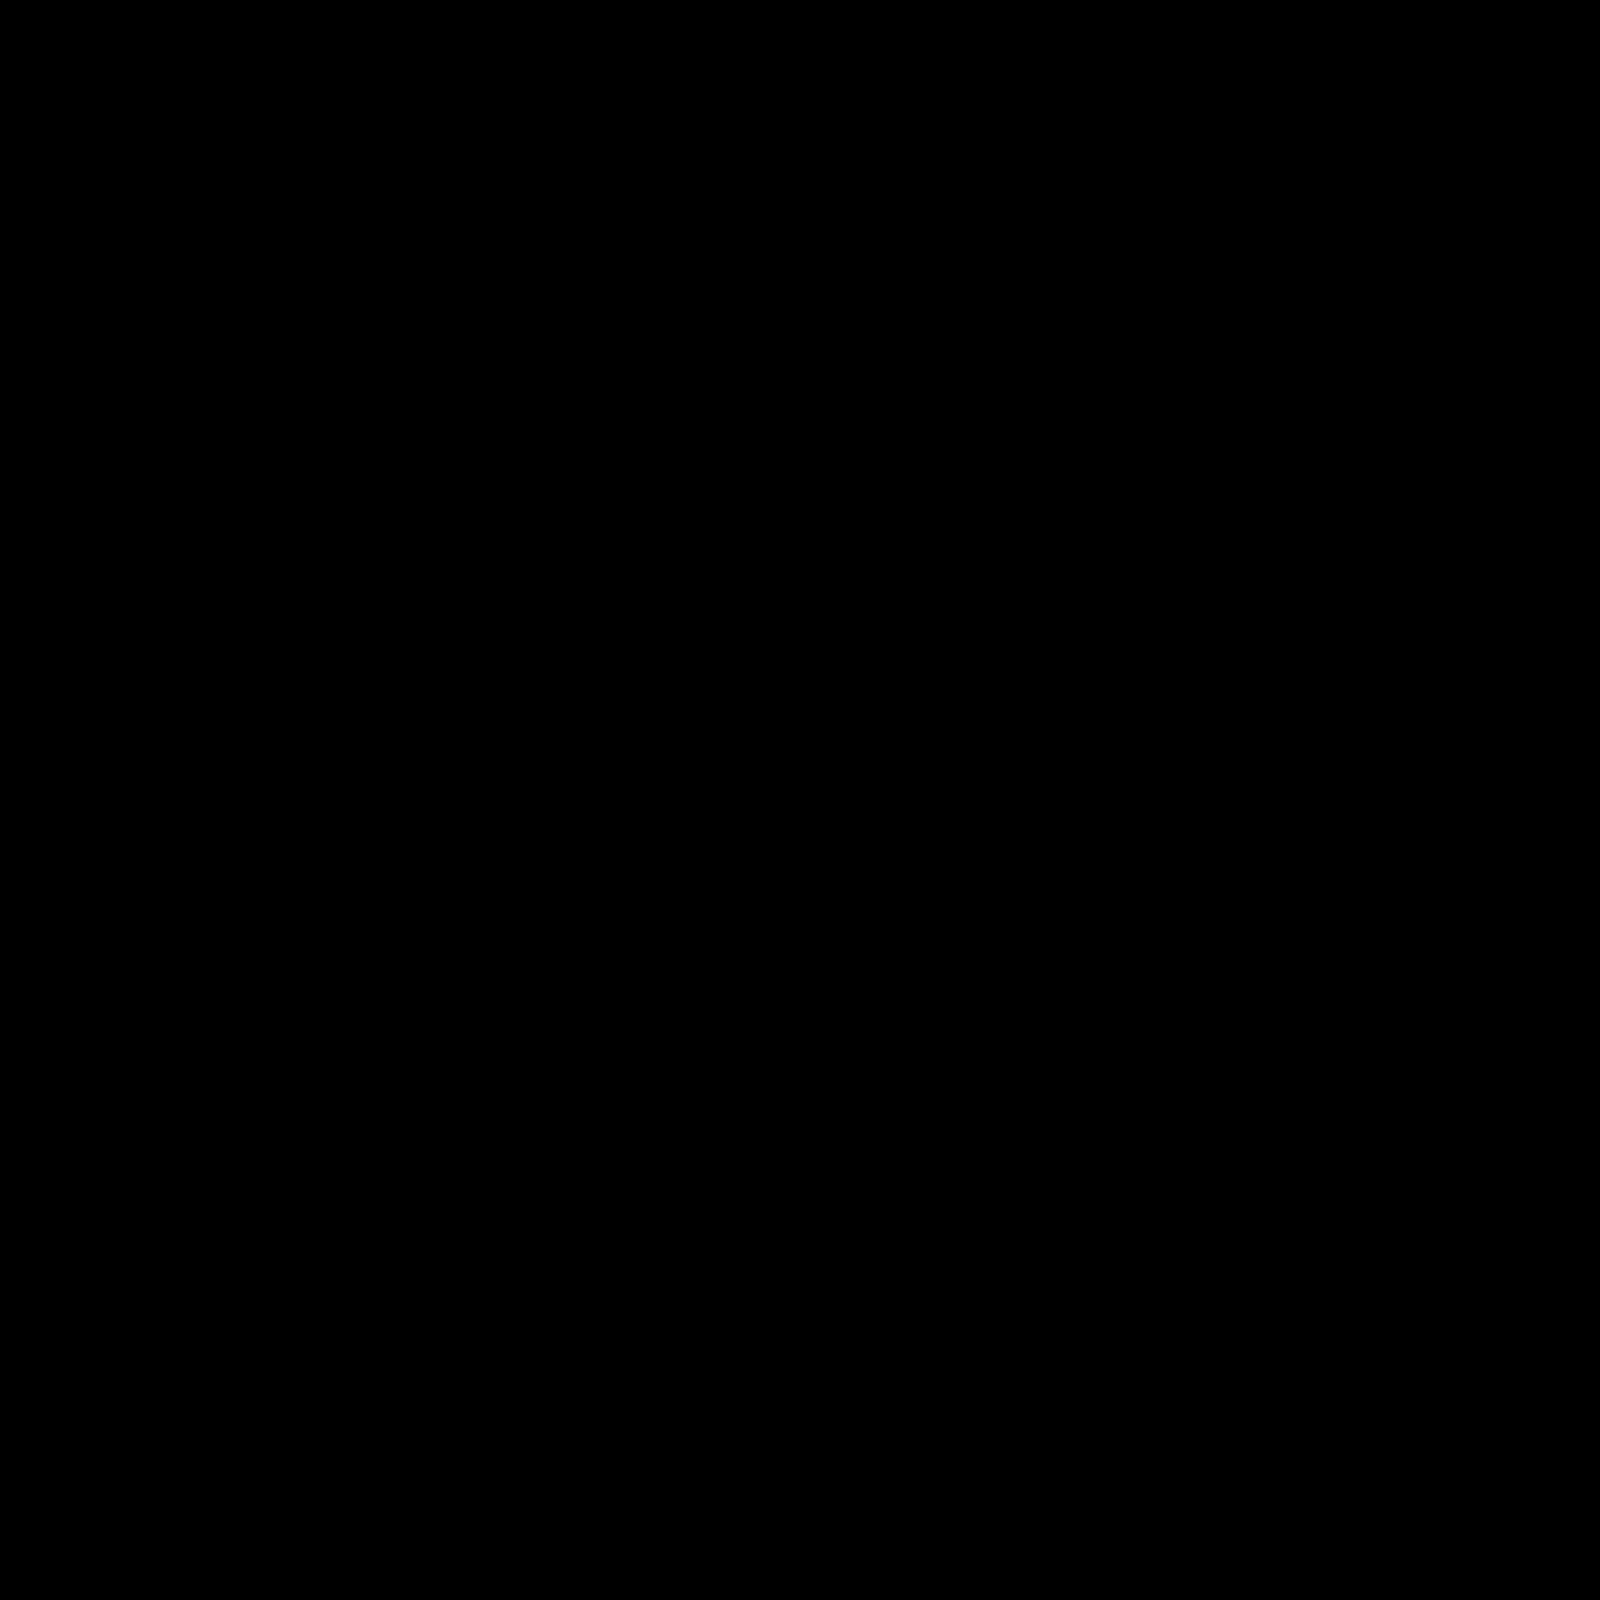 1600x1600 Drop Down Icon